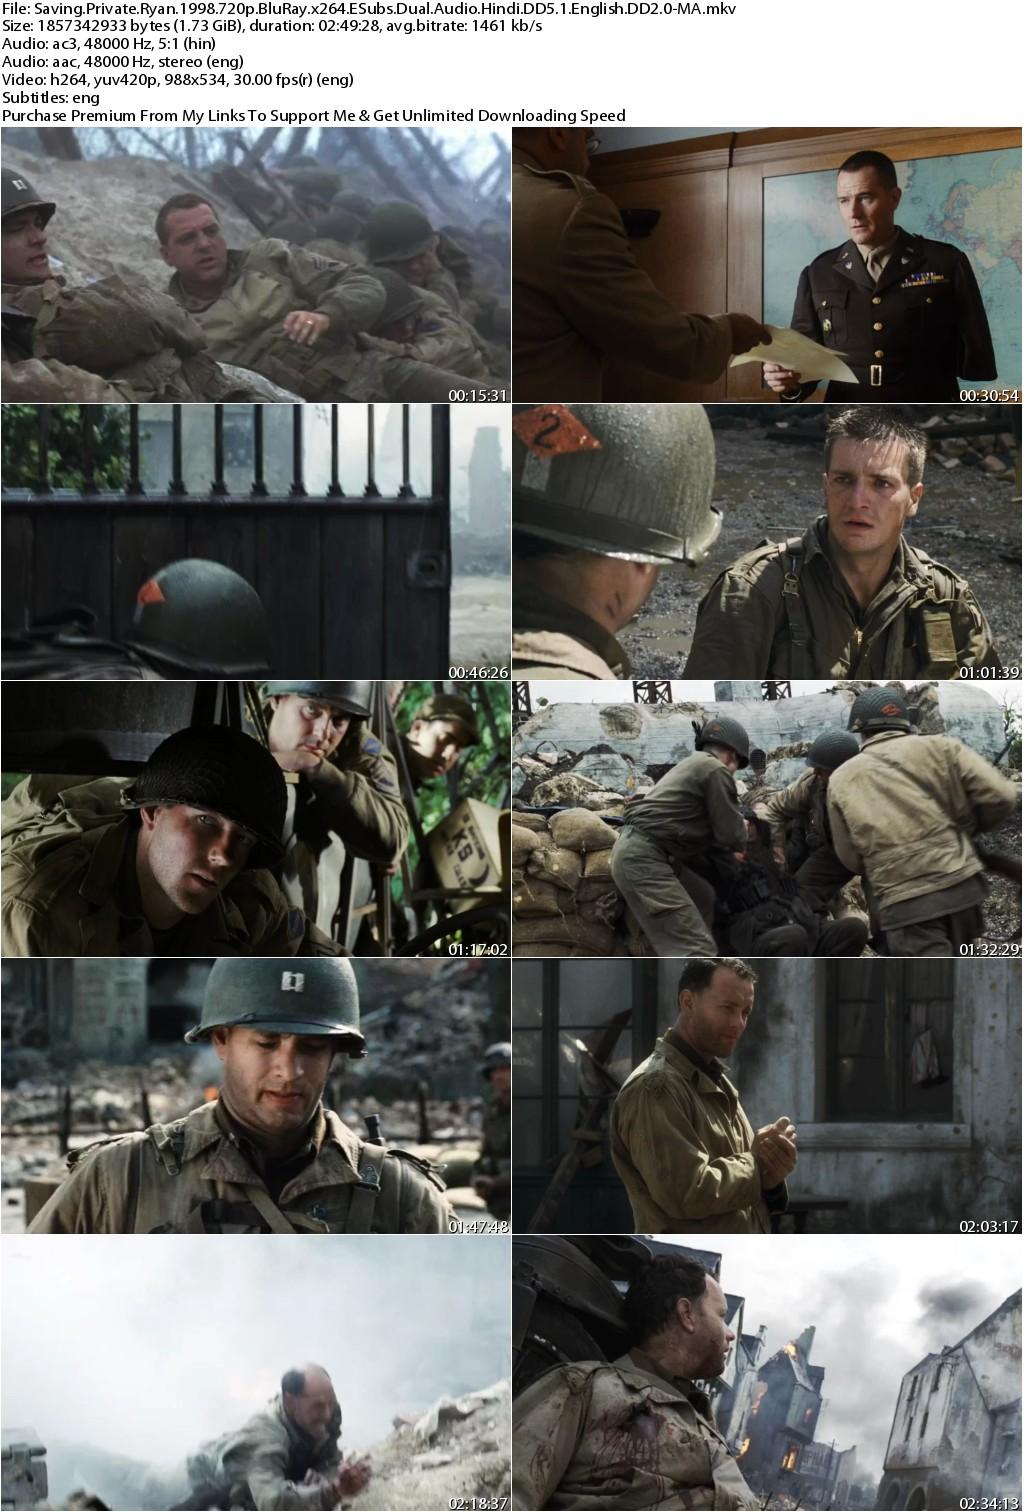 Saving Private Ryan (1998) 720p BluRay x264 ESubs Dual Audio Hindi DD5.1 English DD2.0-MA